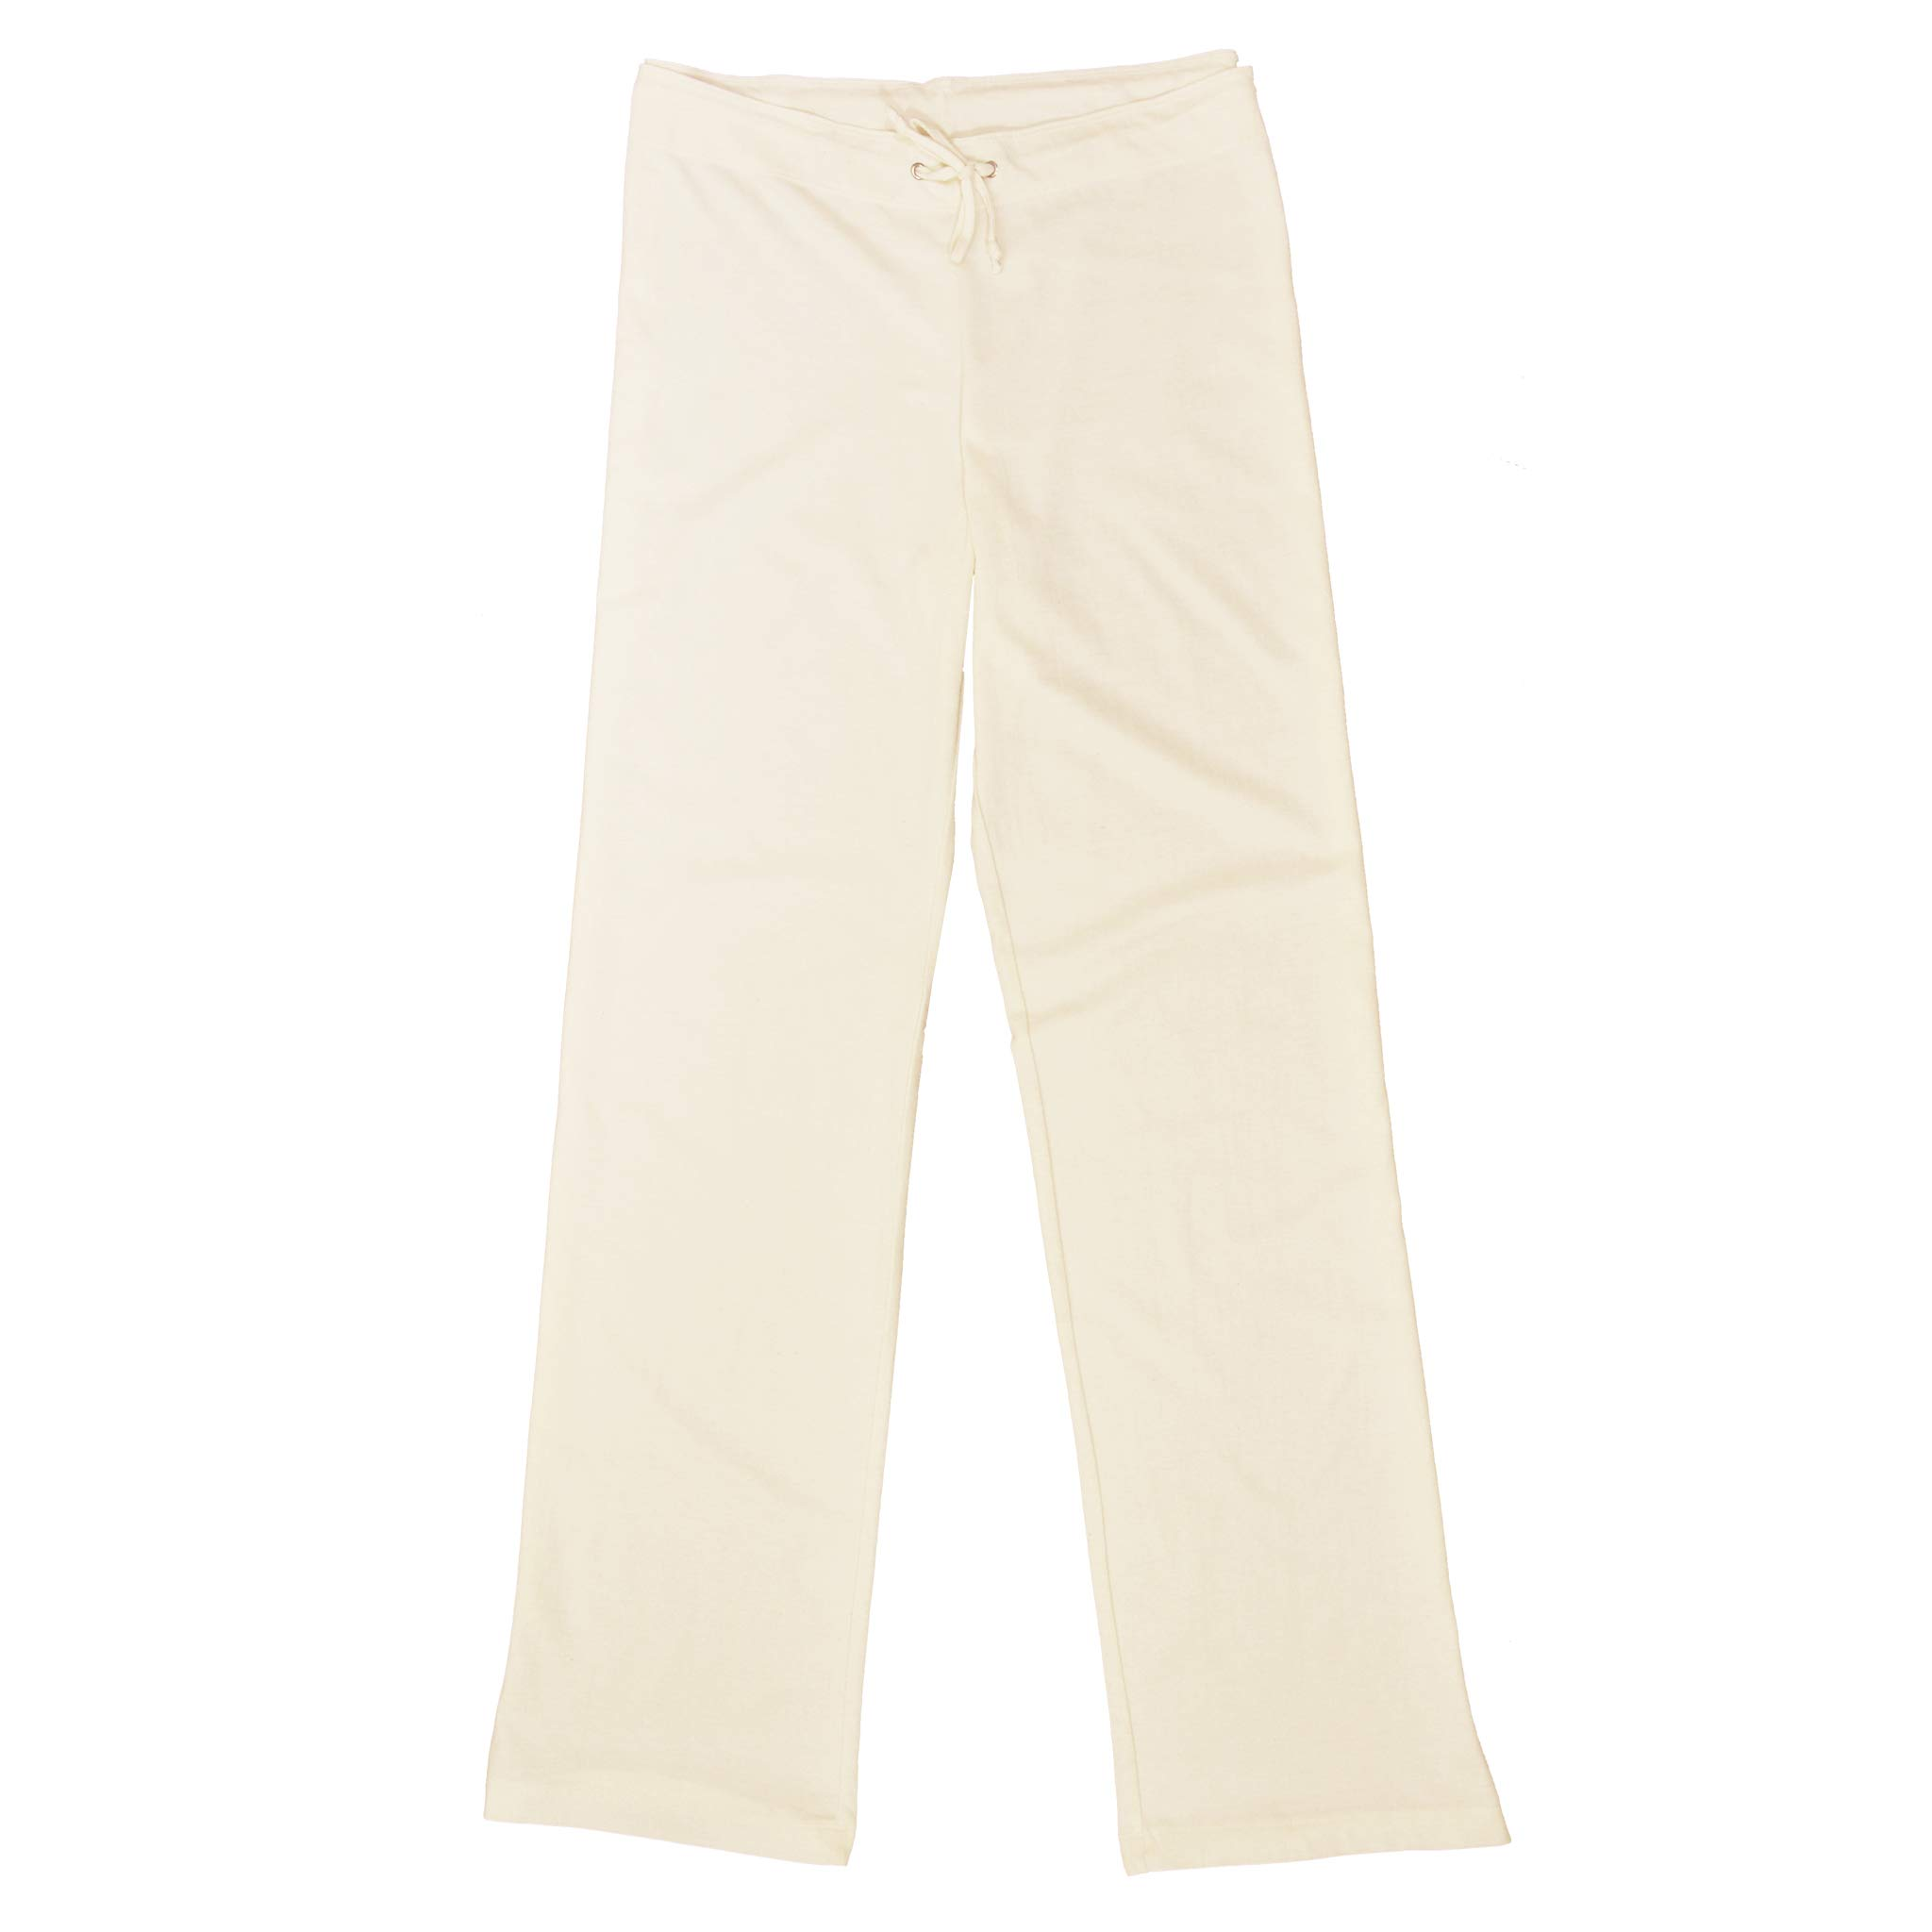 Ecoland Women's Organic Cotton Drawstring Pants Made in USA